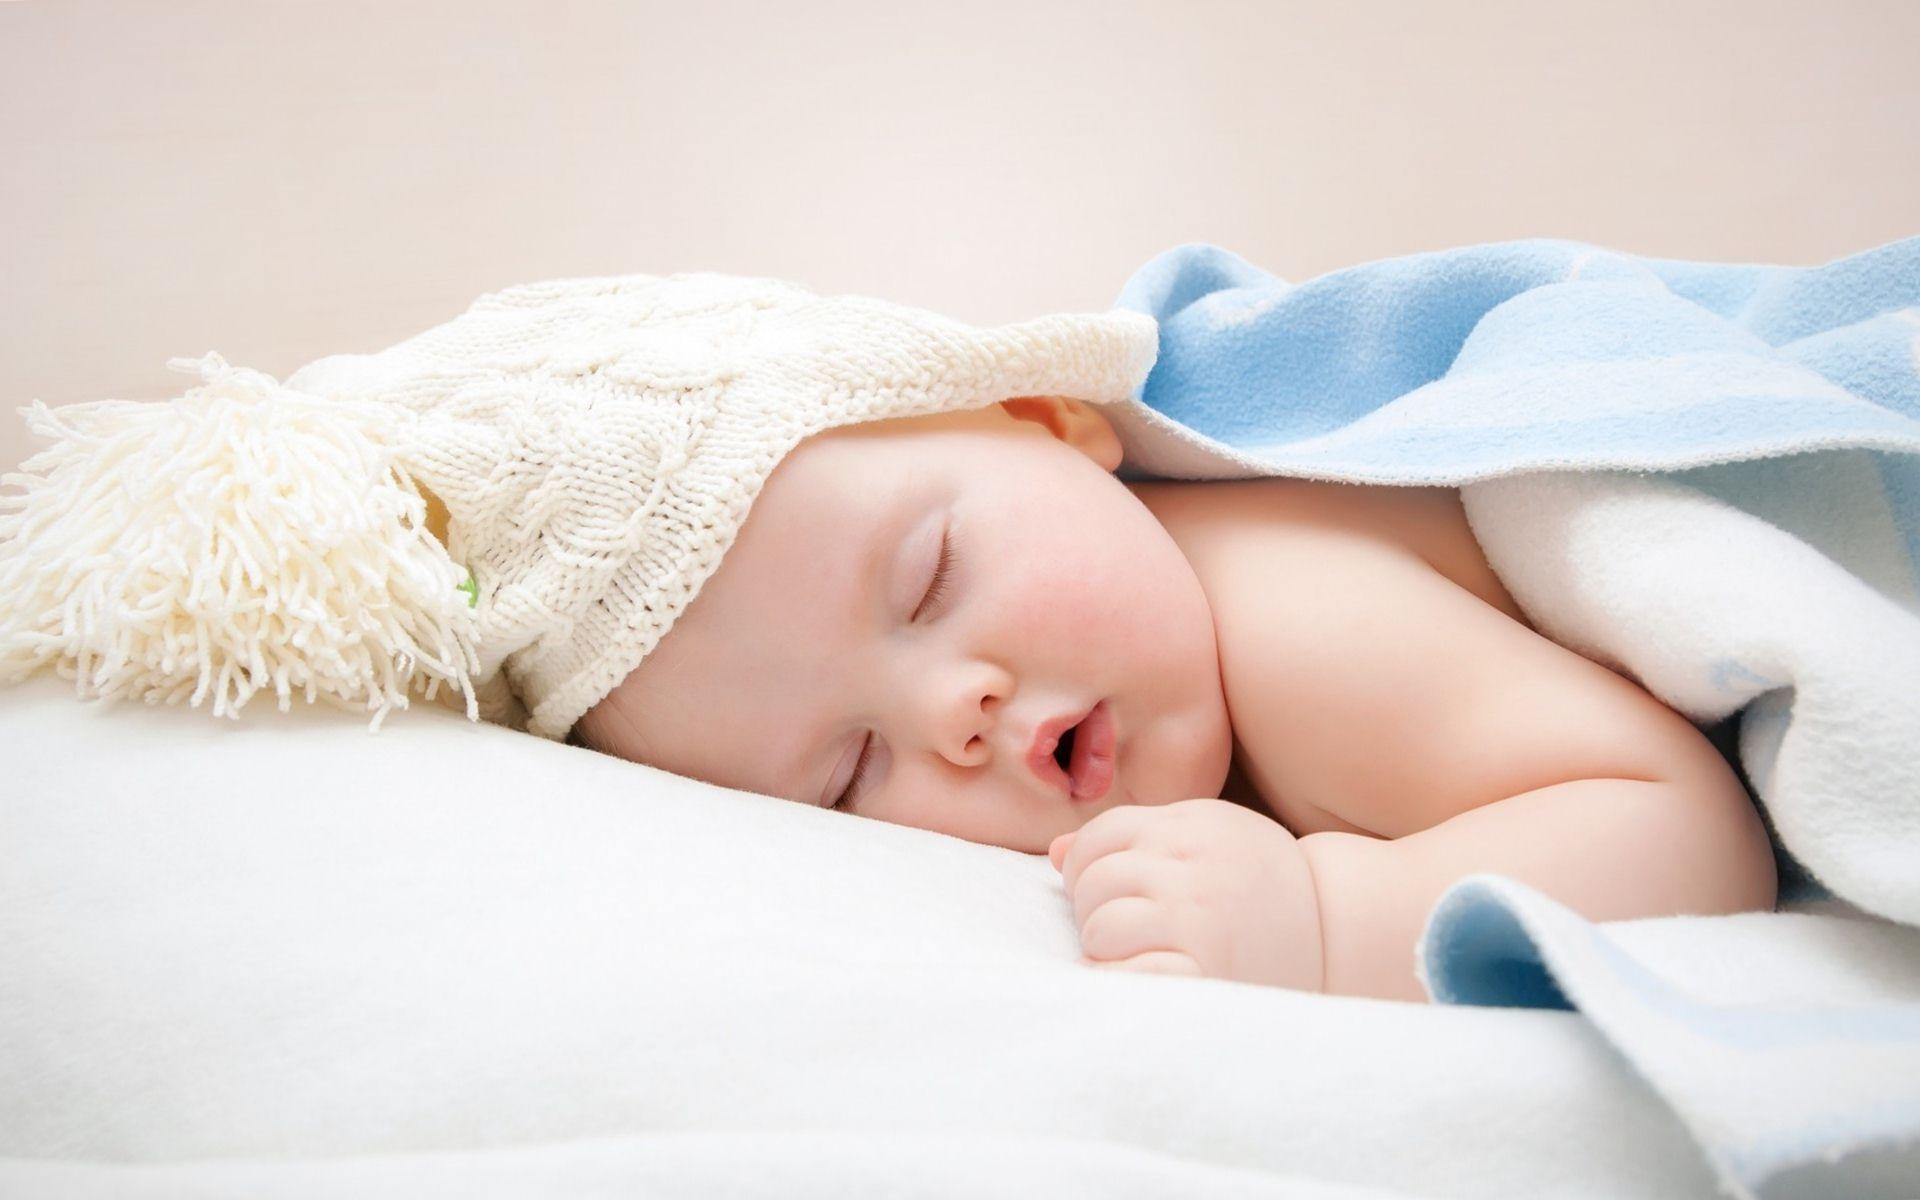 Baby wallpapers win hd desktop wallpapers 4k hd for Baby wallpaper